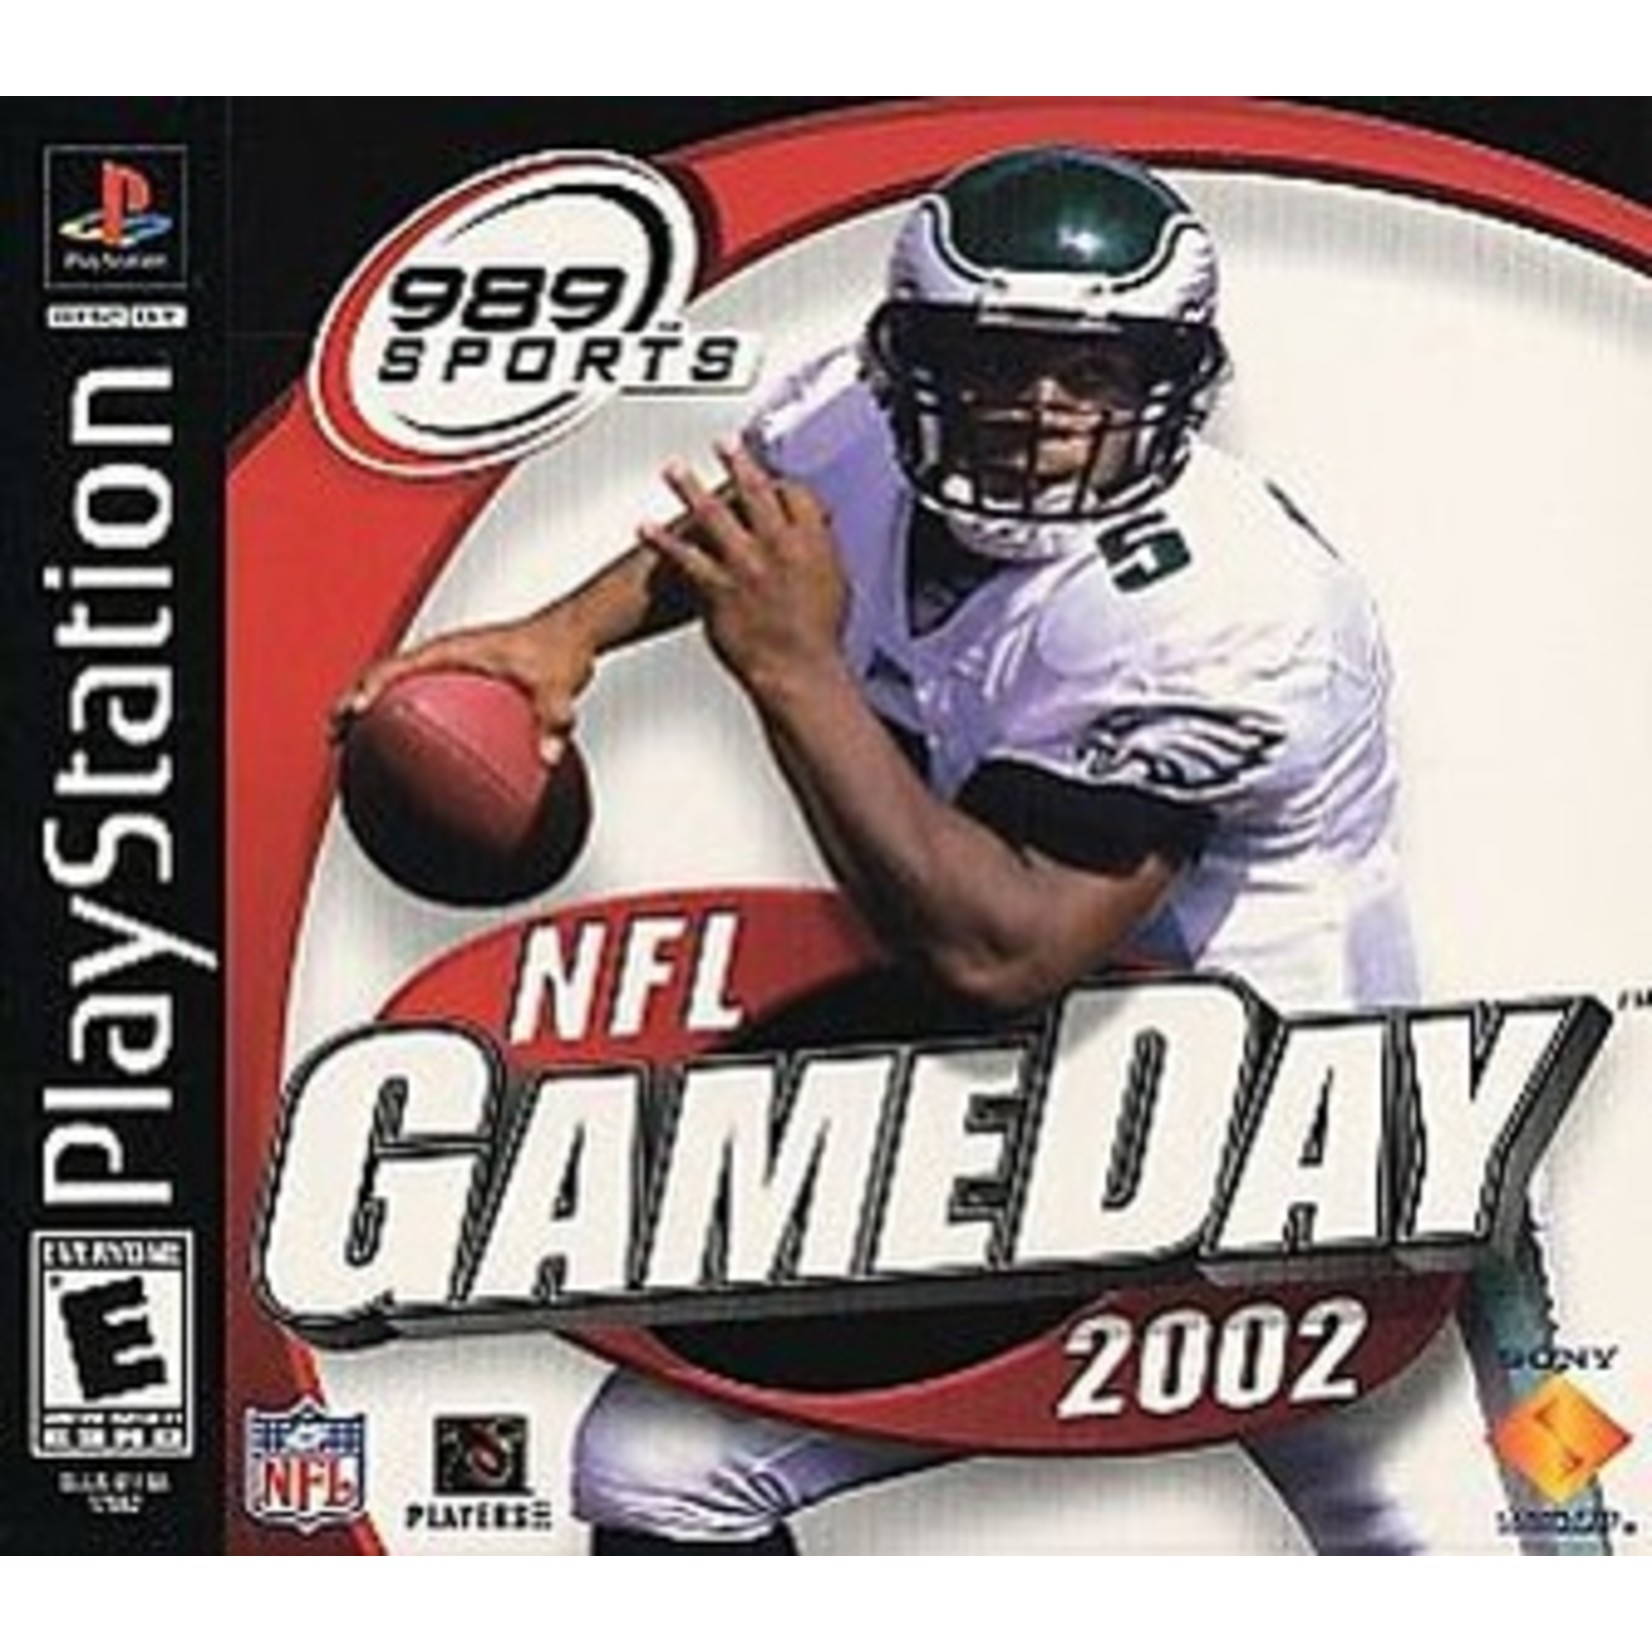 ps2u-NFL Gameday 2002